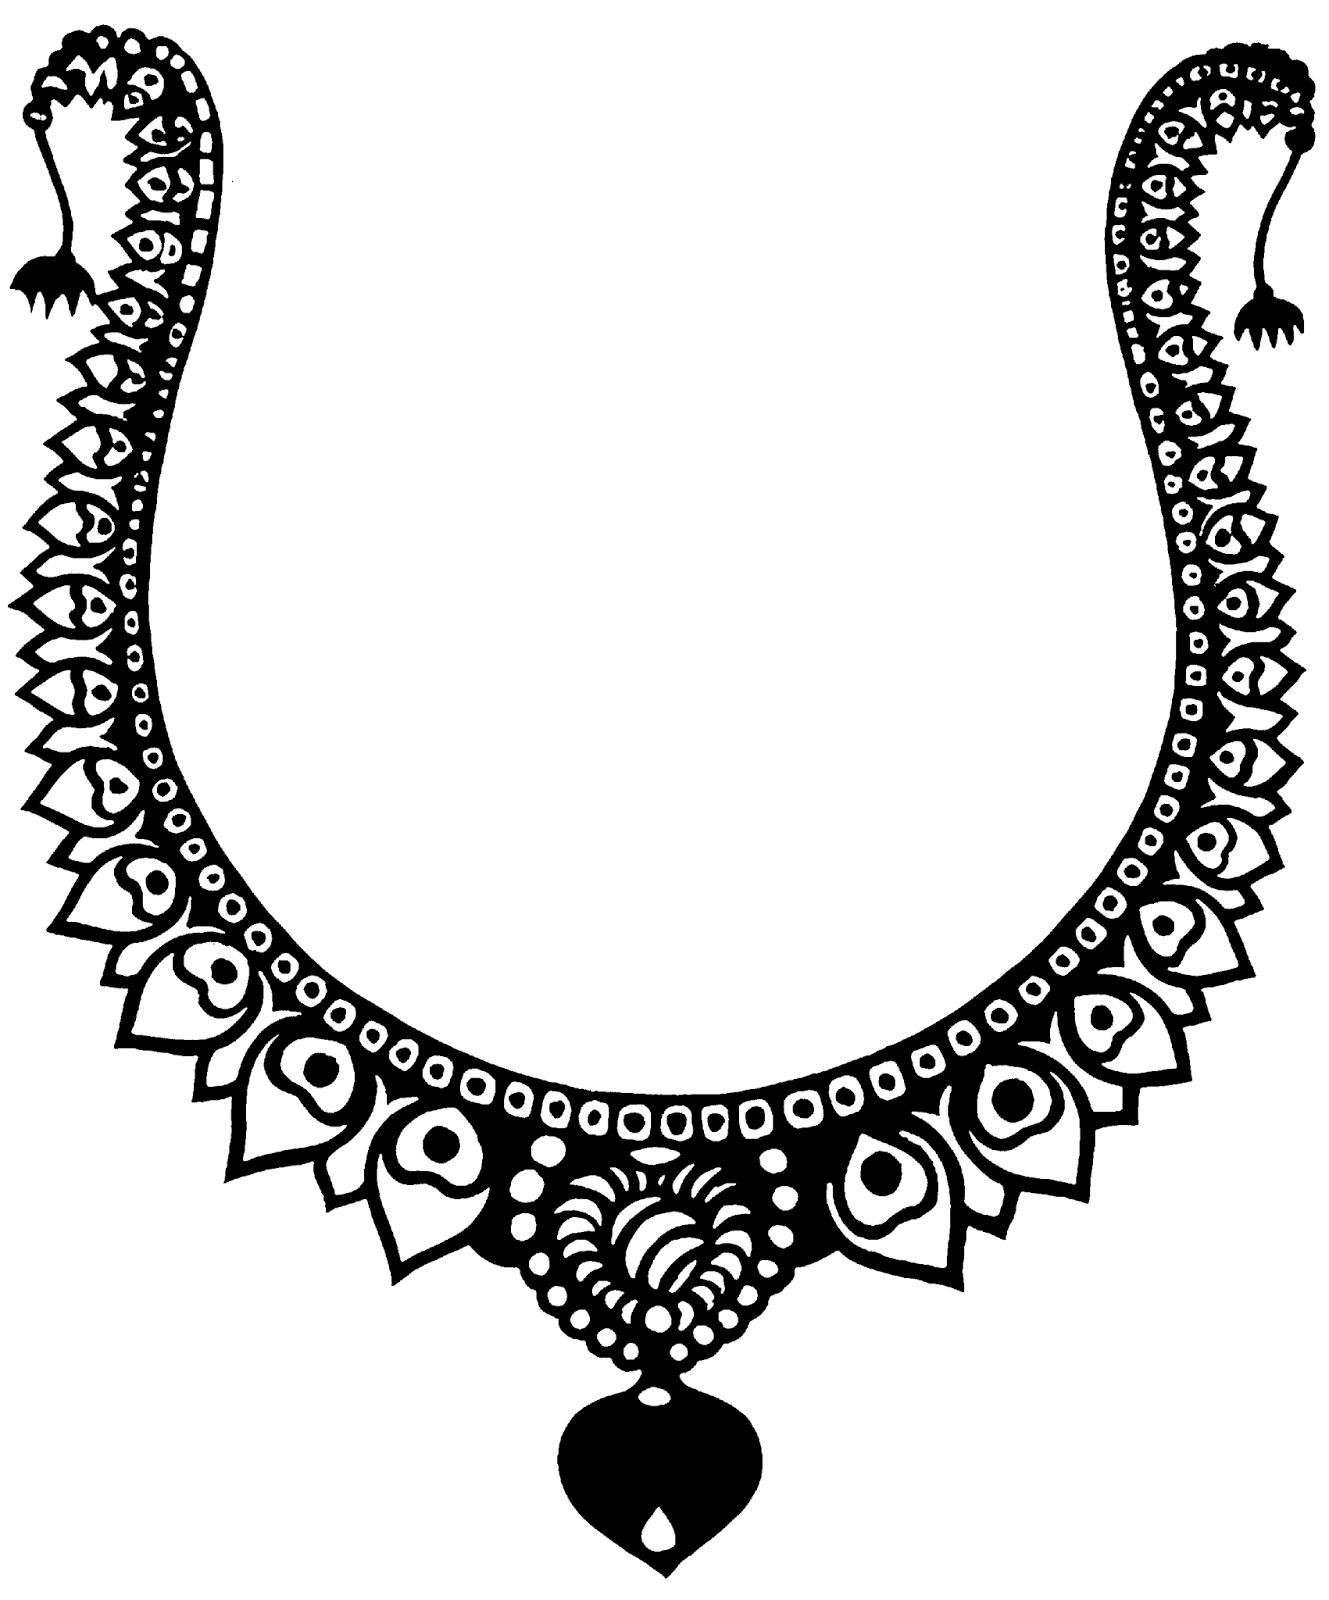 Jewelry Design Line Art : Jewellery clipart october